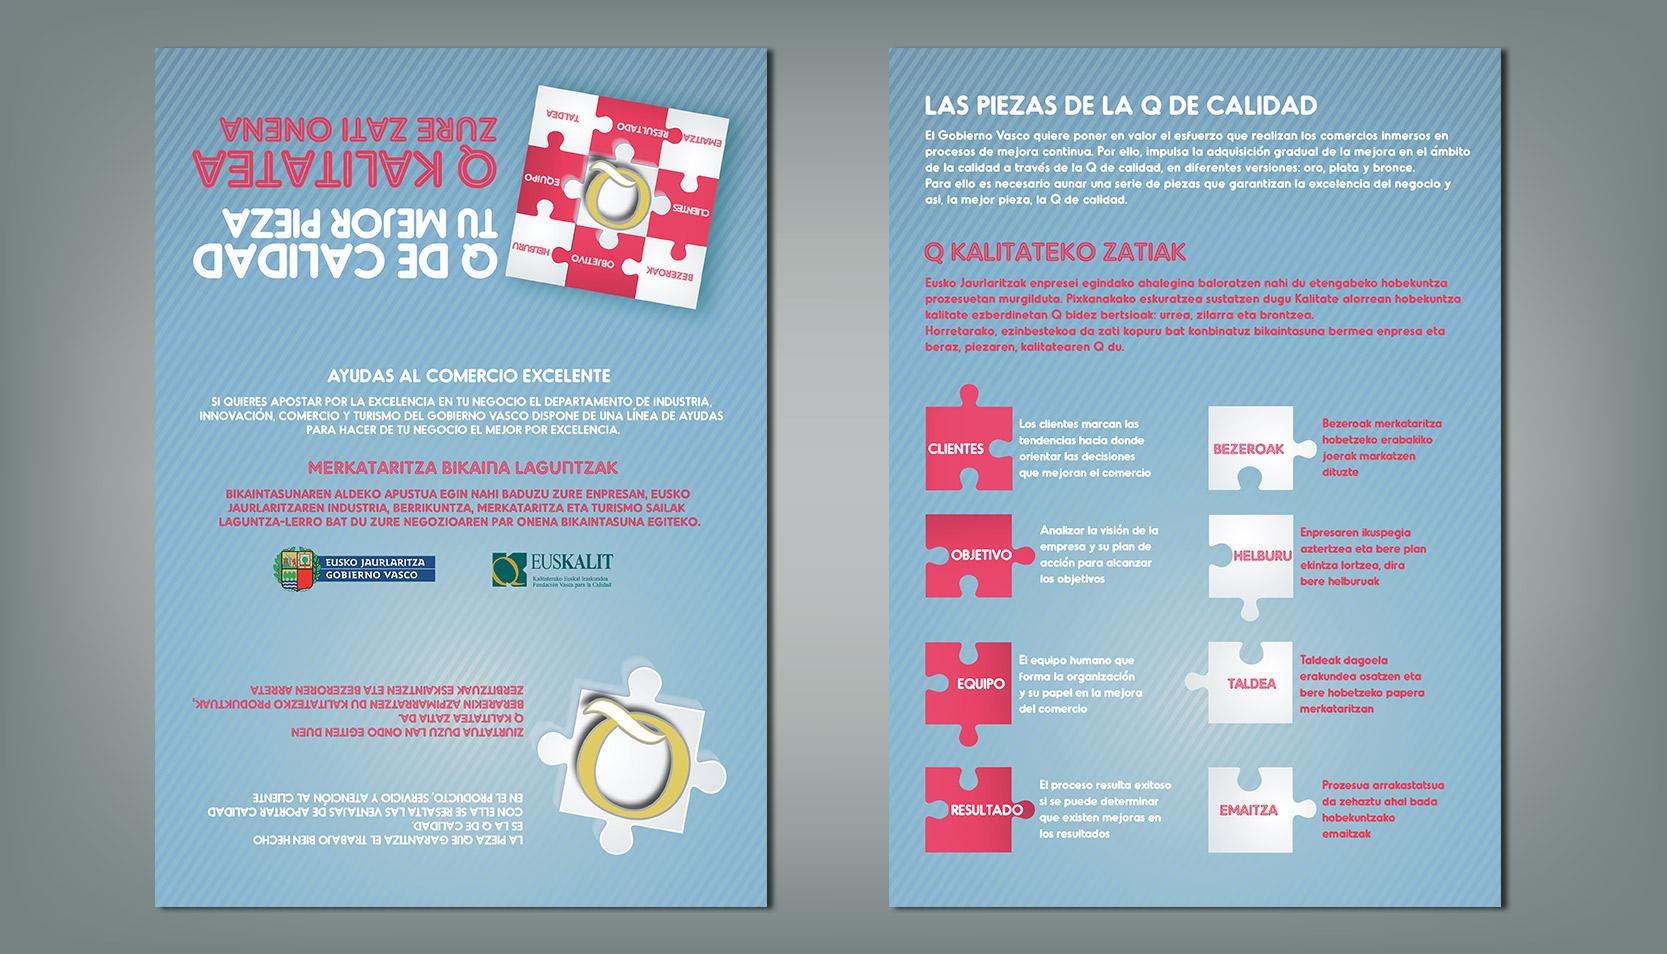 folleto_qcalidad